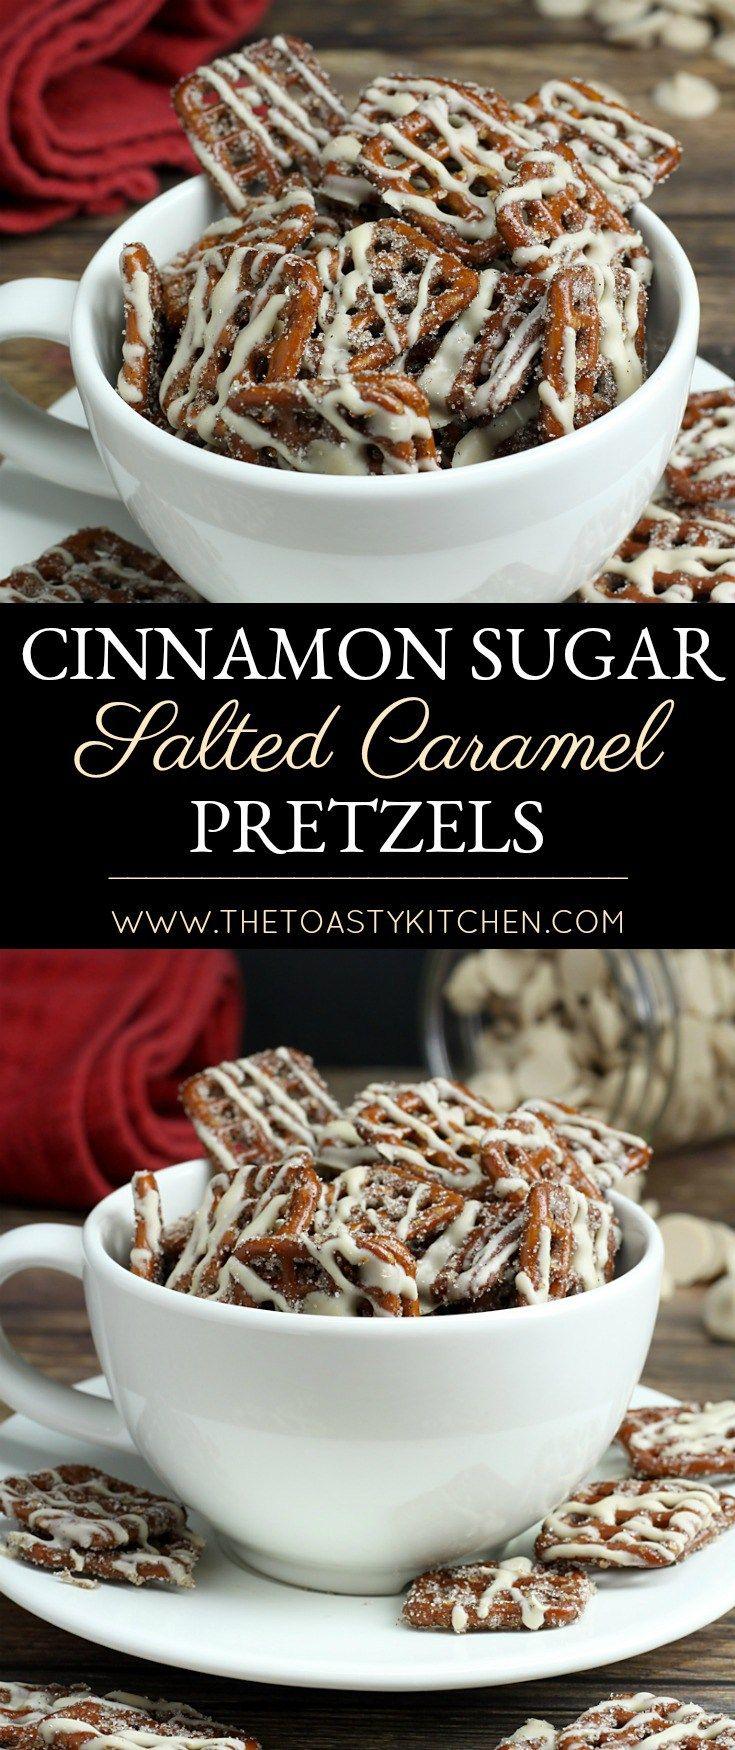 Cinnamon Sugar Salted Caramel Pretzels by The Toasty Kitchen